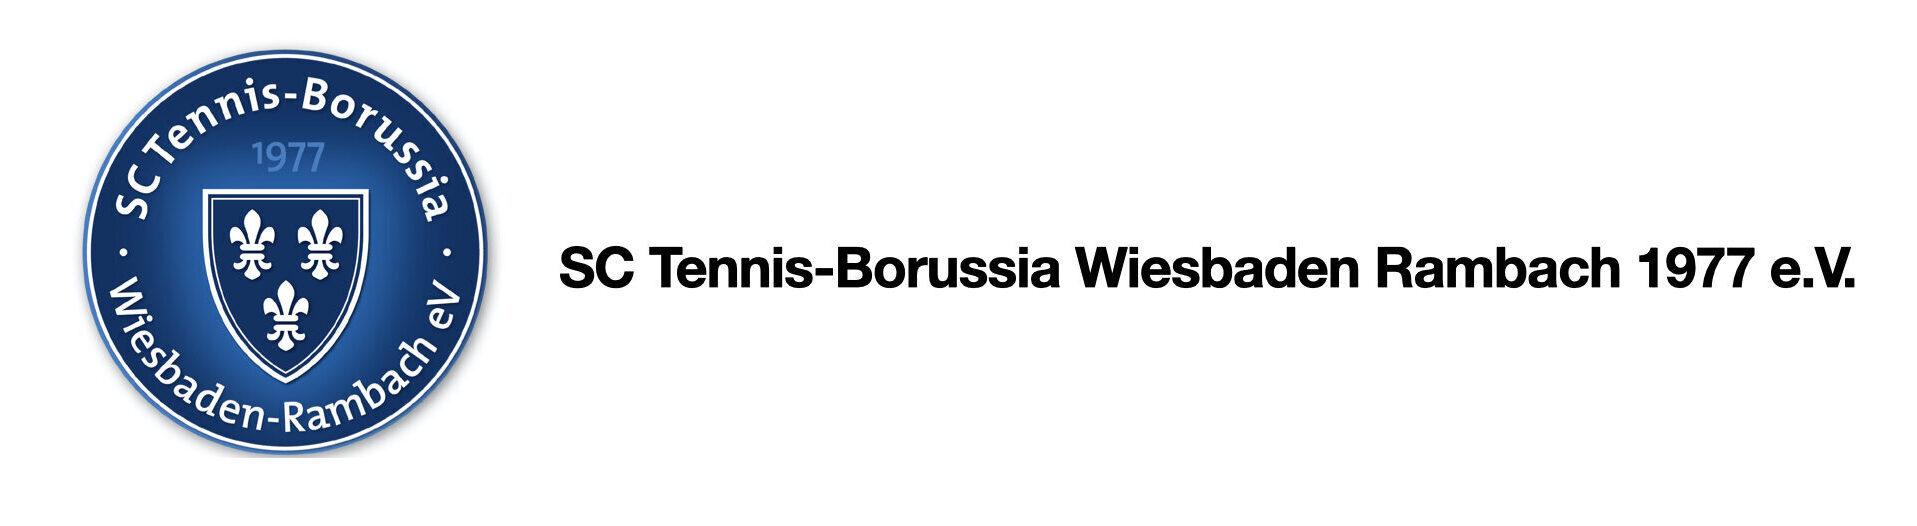 SC Tennis-Borussia Rambach